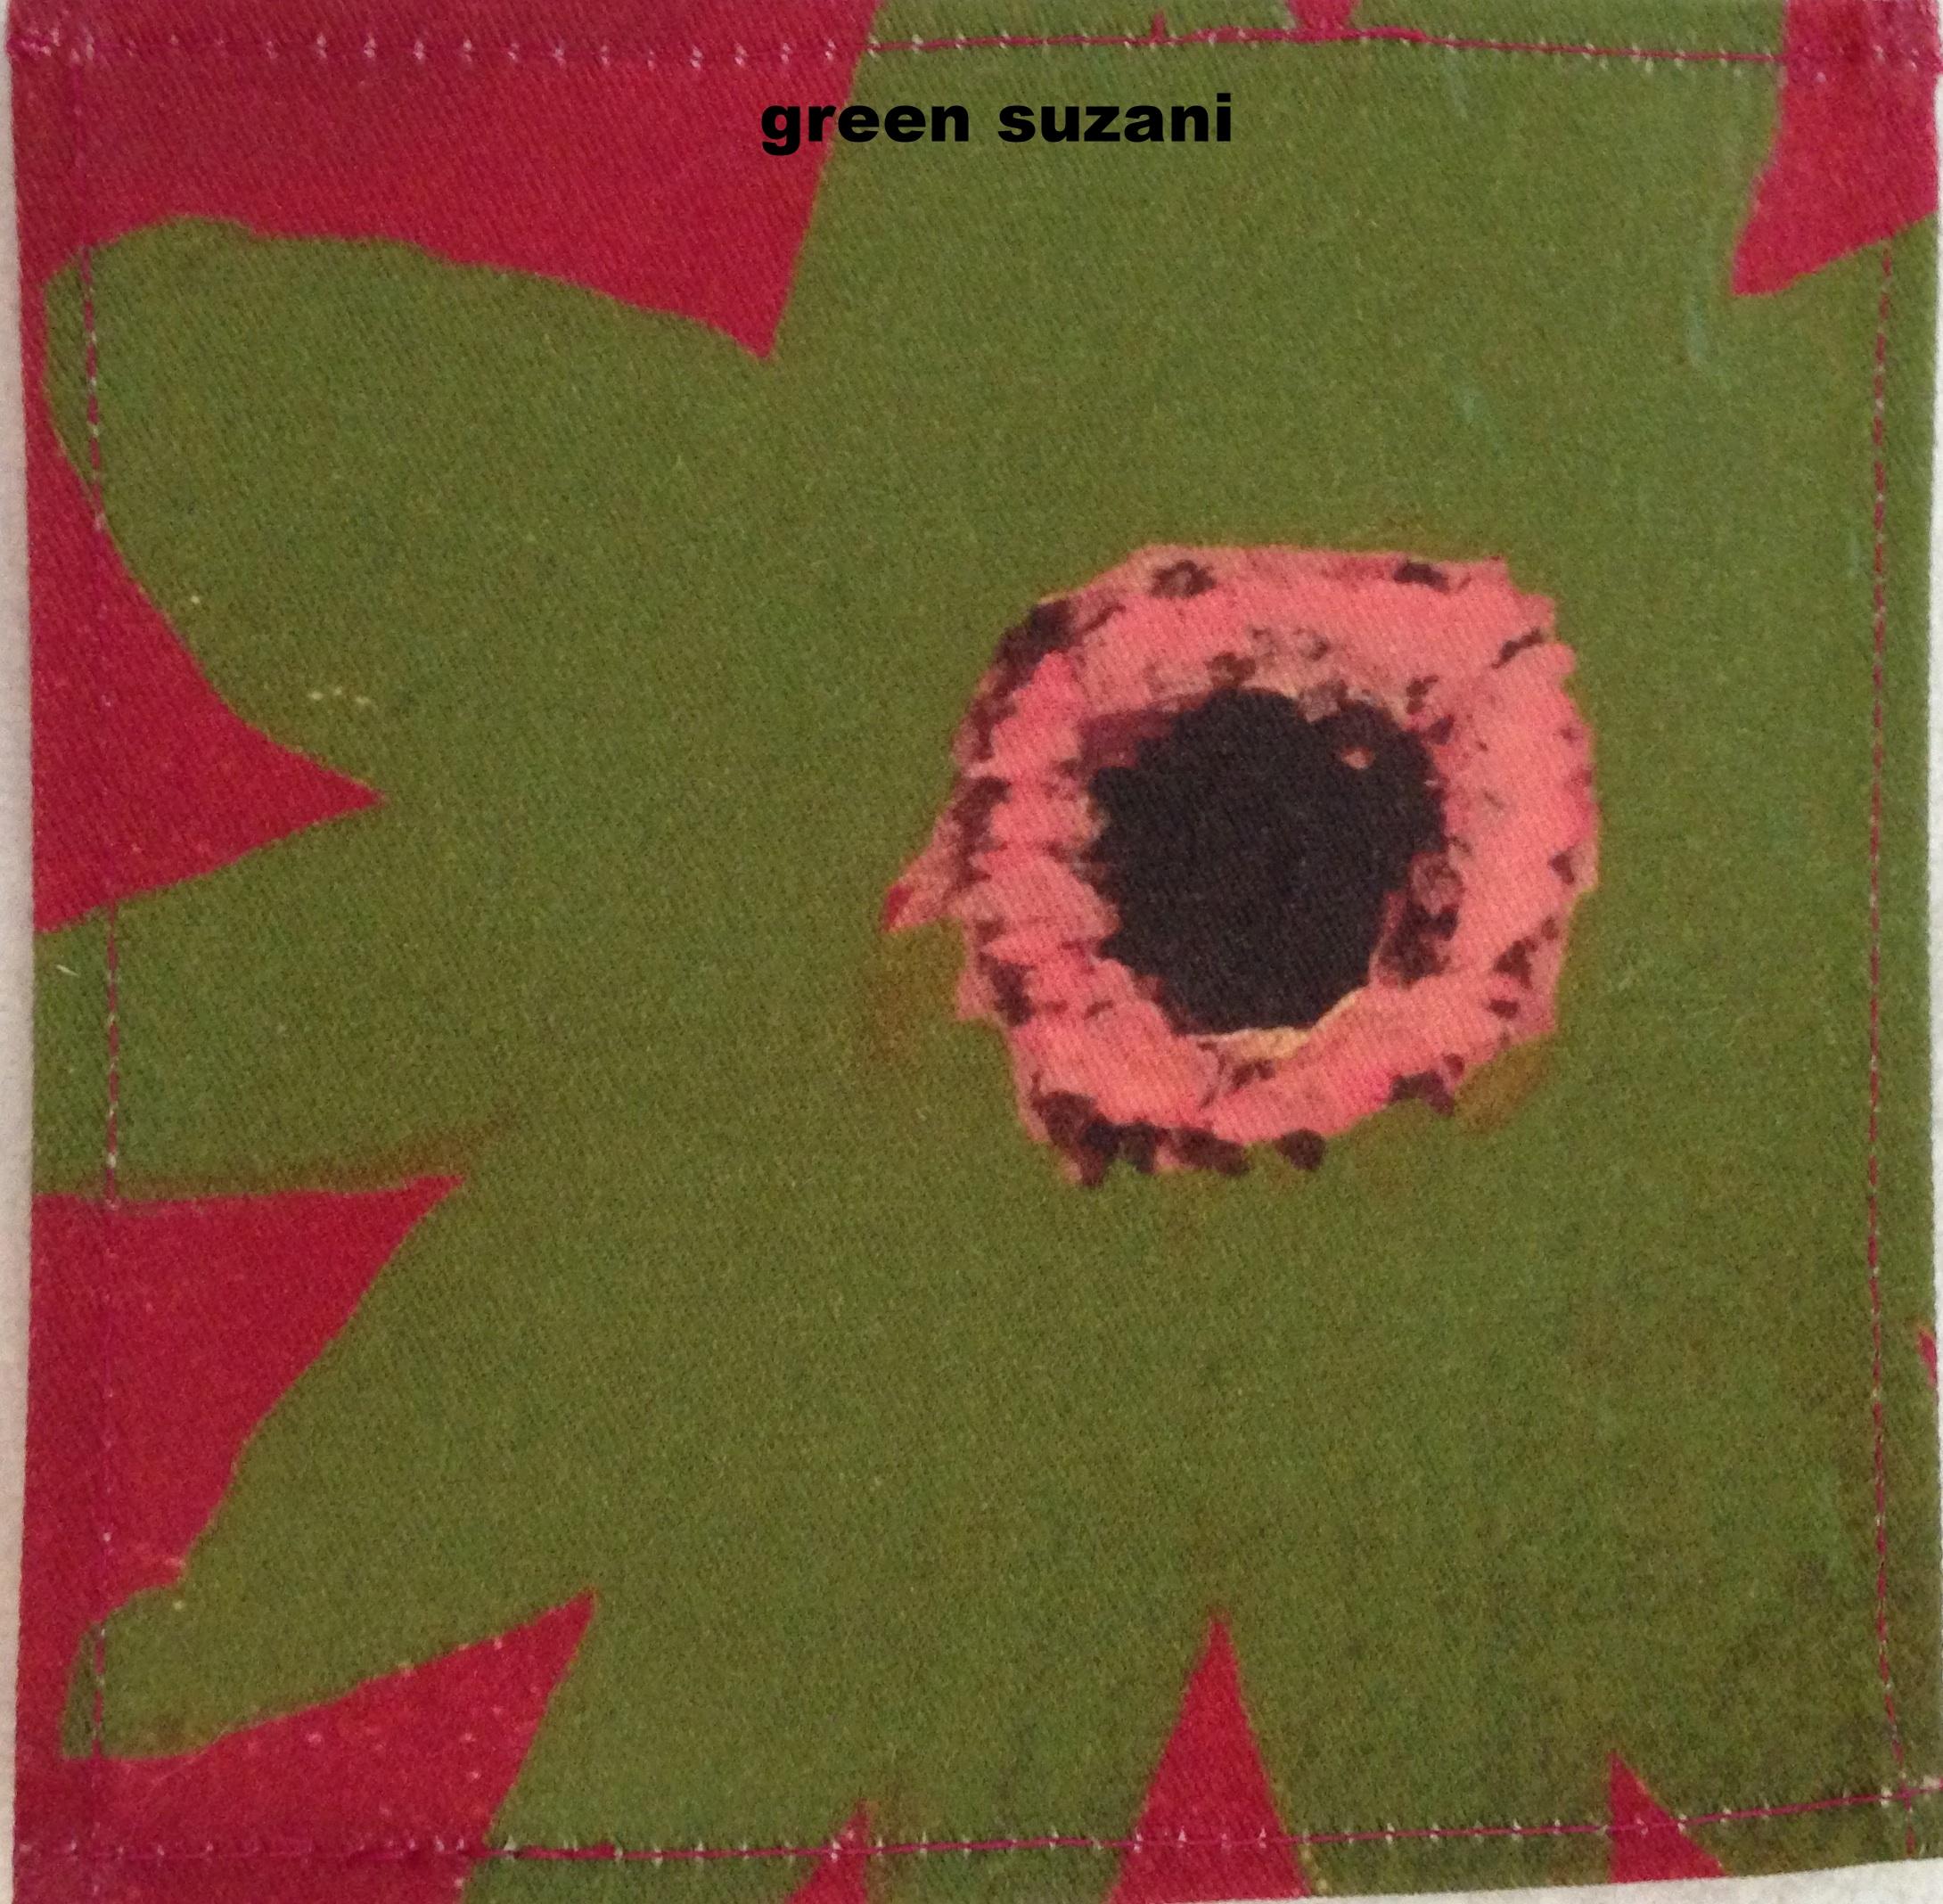 suzani - green